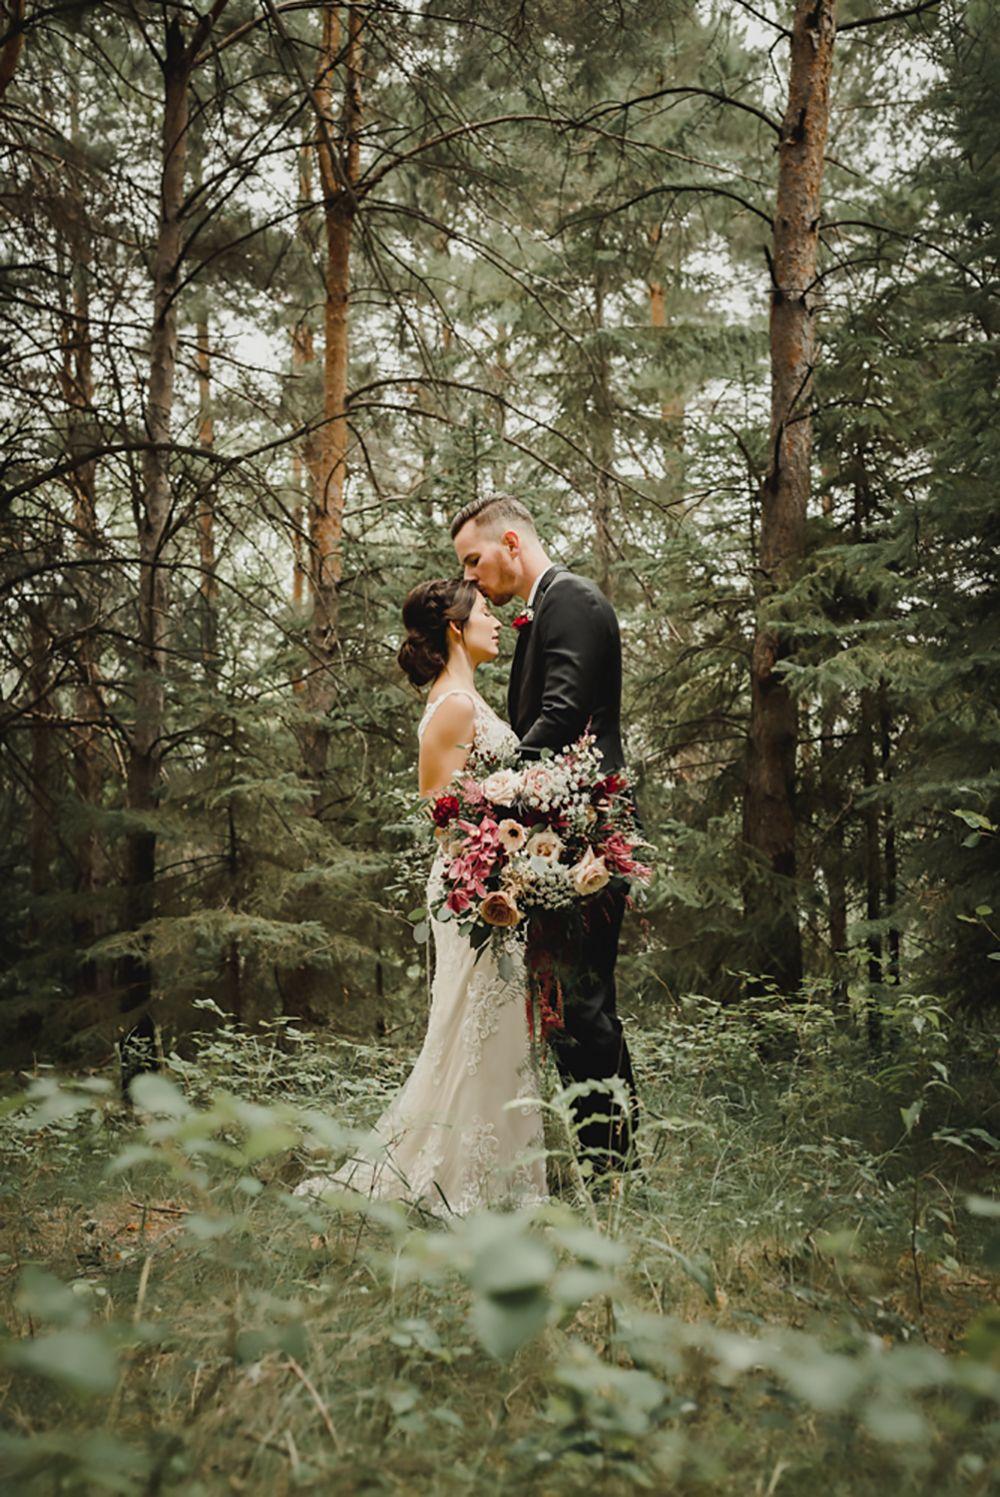 Canadas Most Beautiful Wedding Locations | Weddingbells